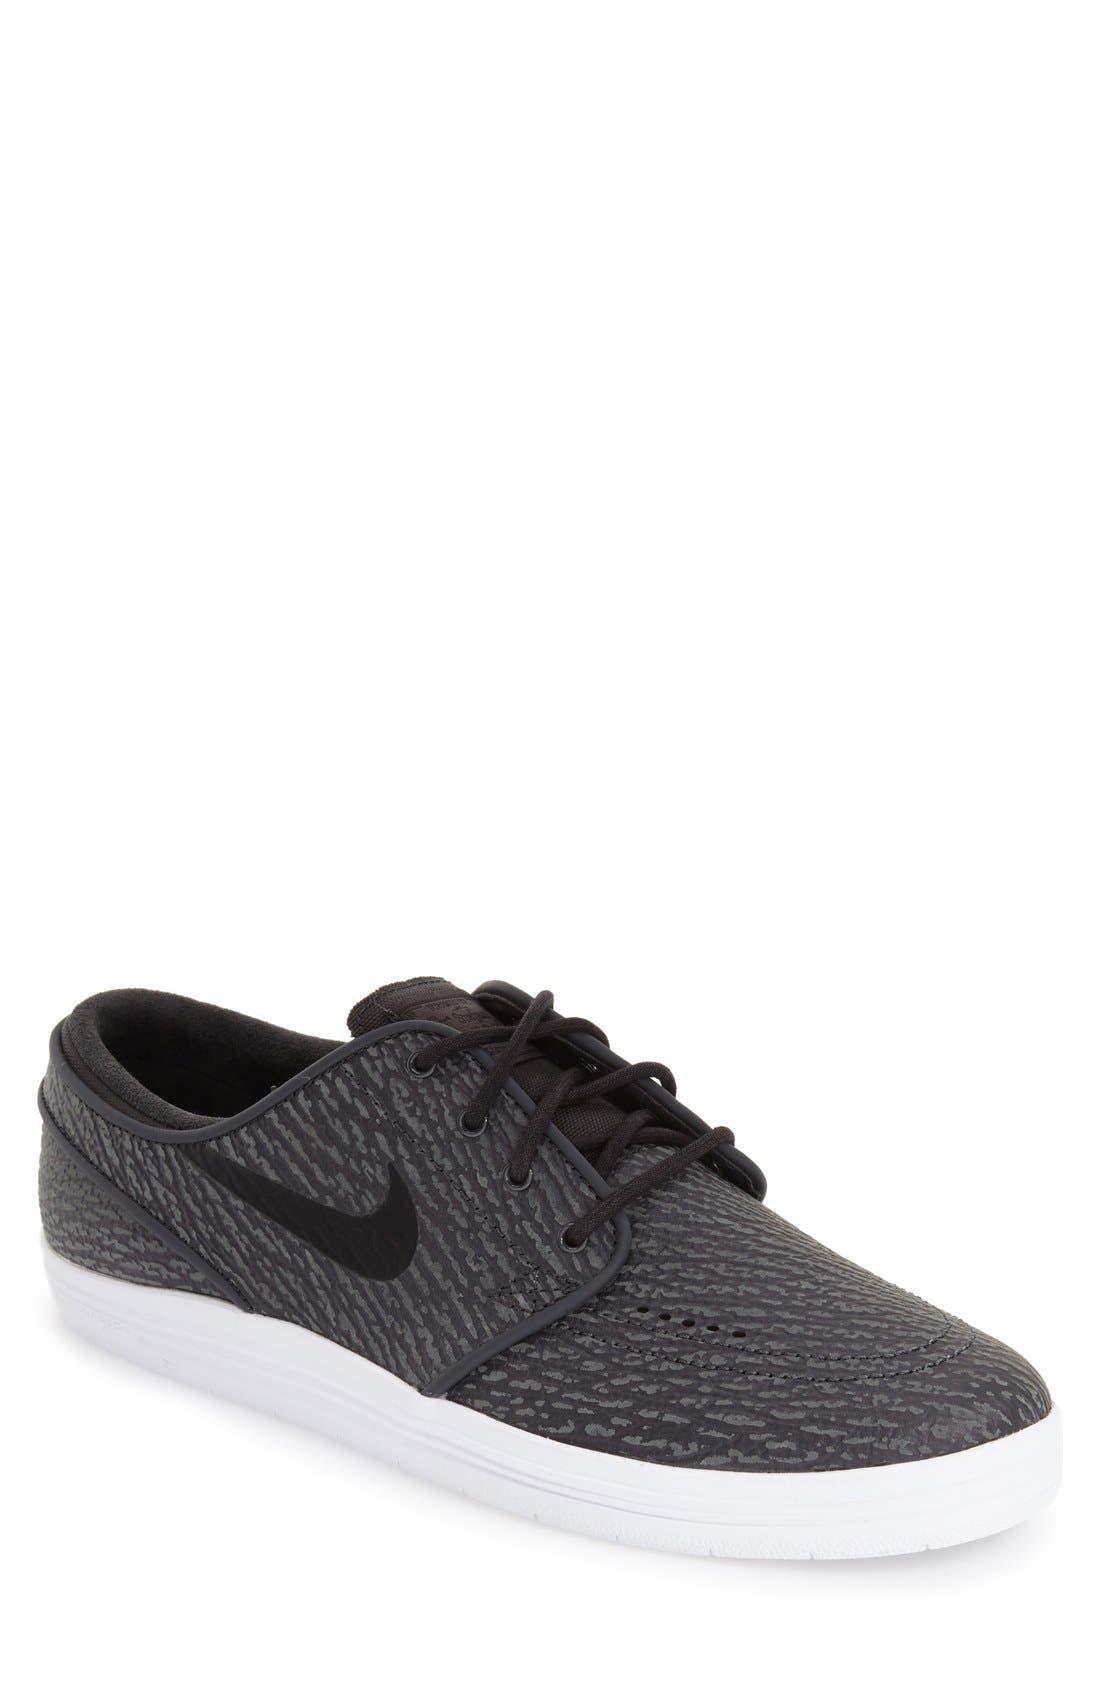 Main Image - Nike 'Lunar - Stefan Janoski SB' Skate Shoe (Men)